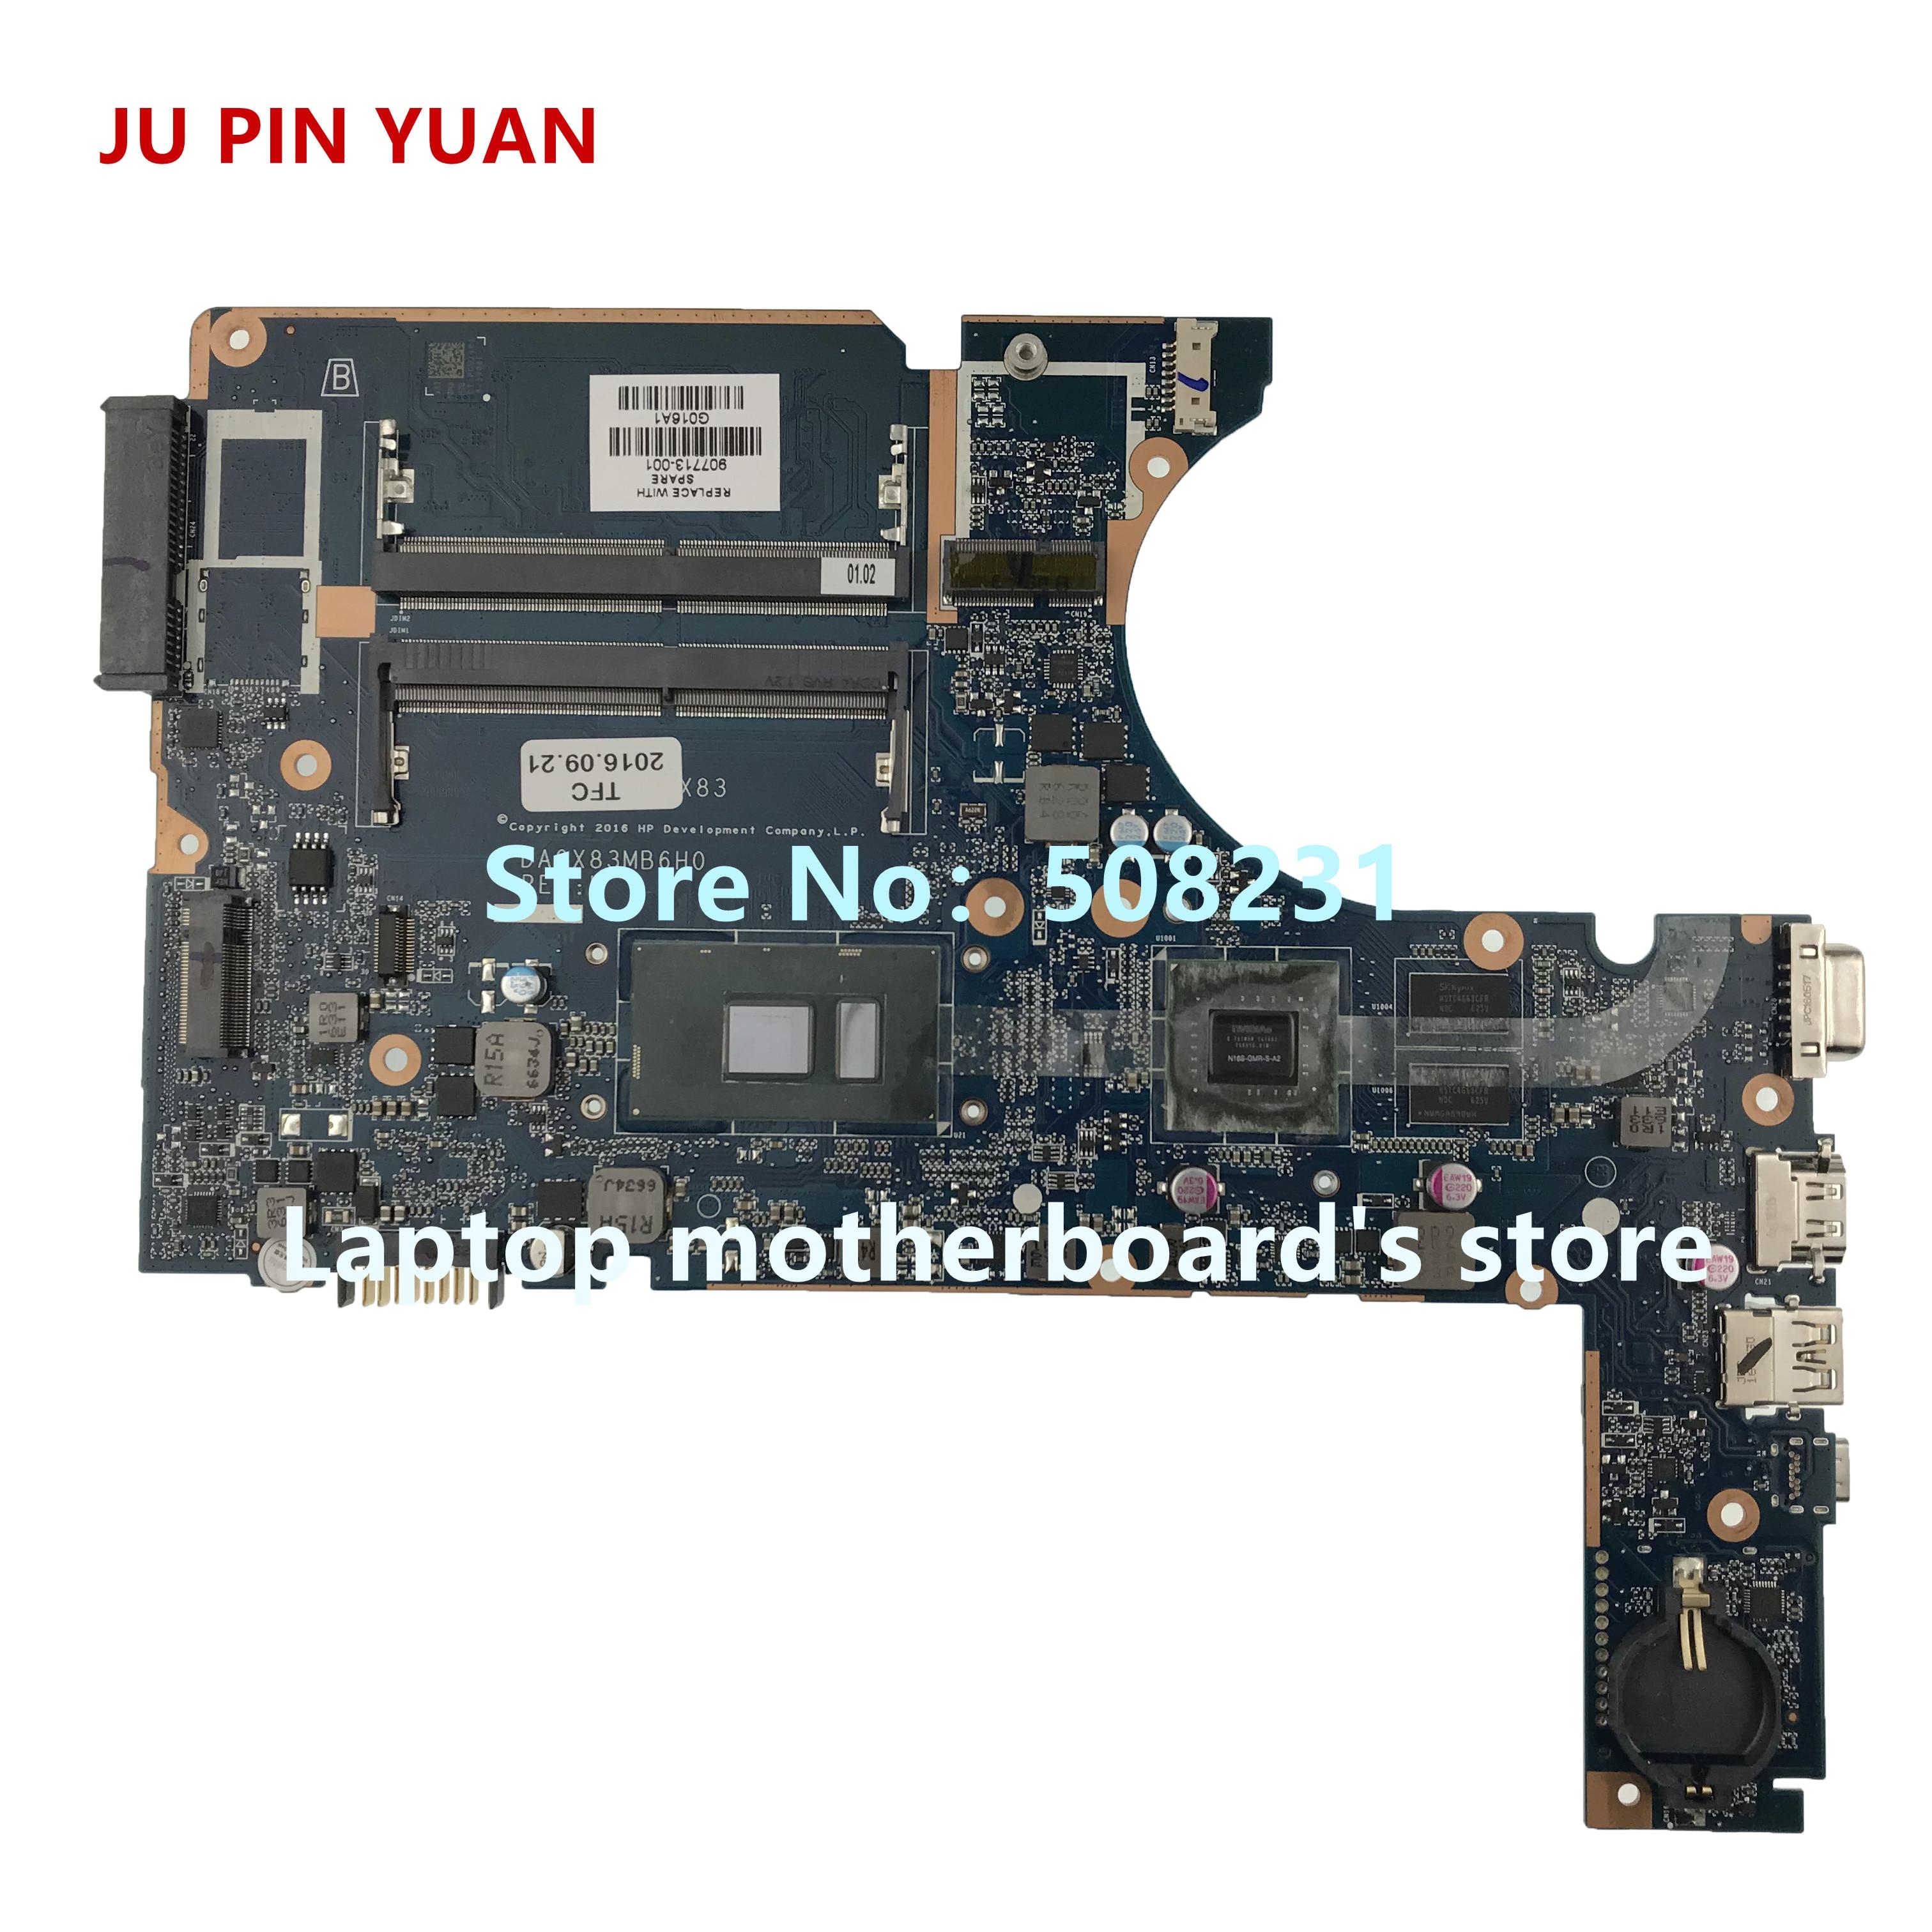 JU PIN YUAN 907713-601 907713-001 DA0X83MB6H0 For HP ProBook 450 G4 470 G4 Laptop motherboard I3-7100U fully TestedJU PIN YUAN 907713-601 907713-001 DA0X83MB6H0 For HP ProBook 450 G4 470 G4 Laptop motherboard I3-7100U fully Tested